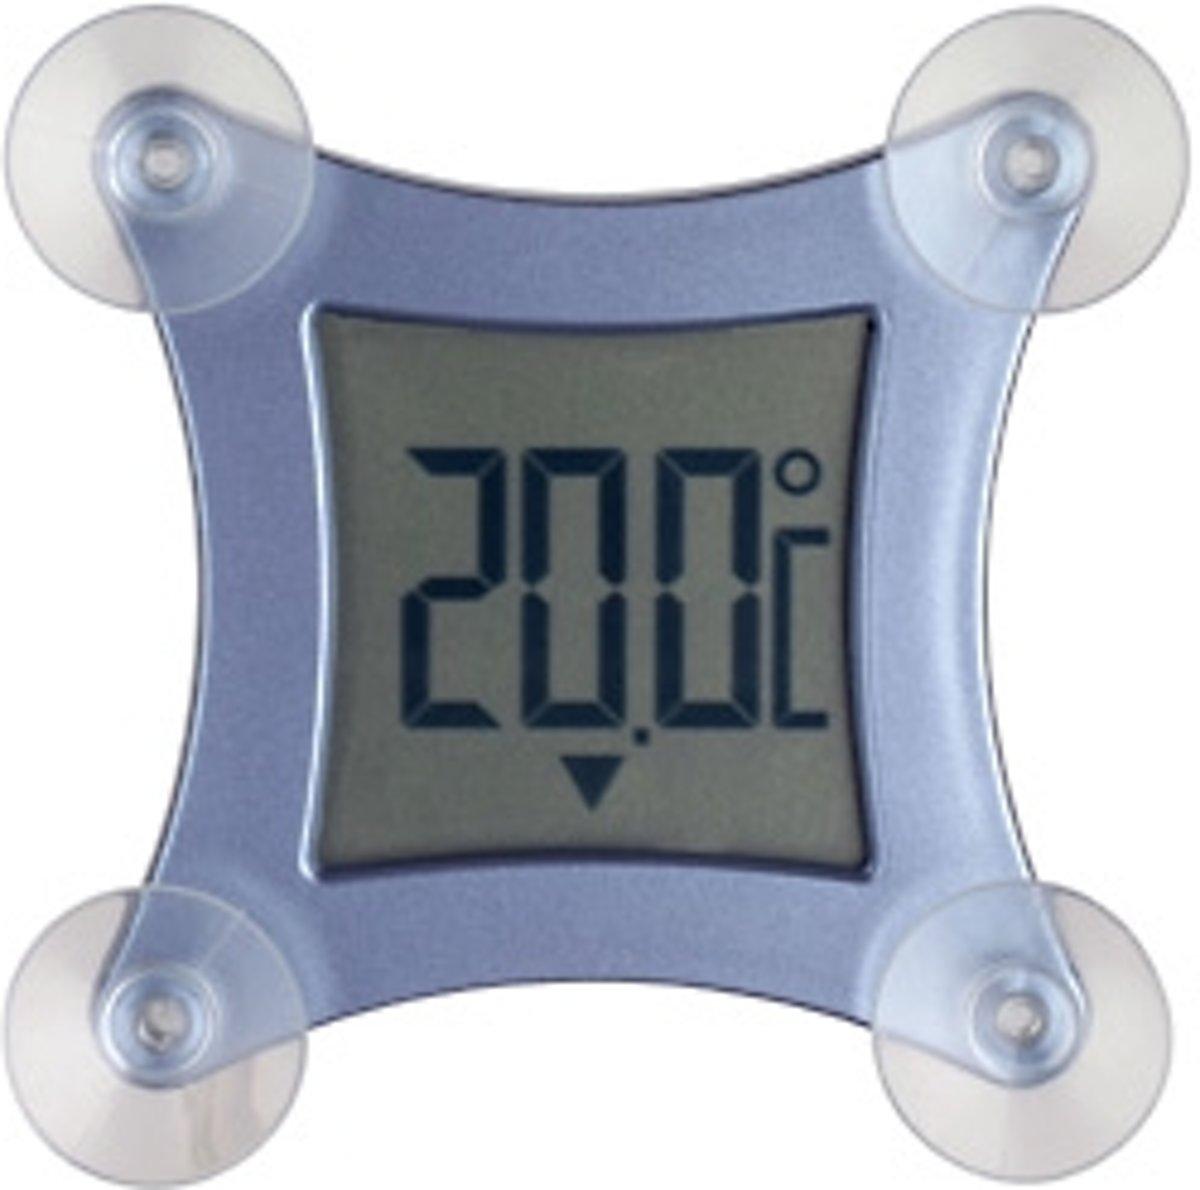 TFA 30.1026 digitale lichaams thermometer kopen